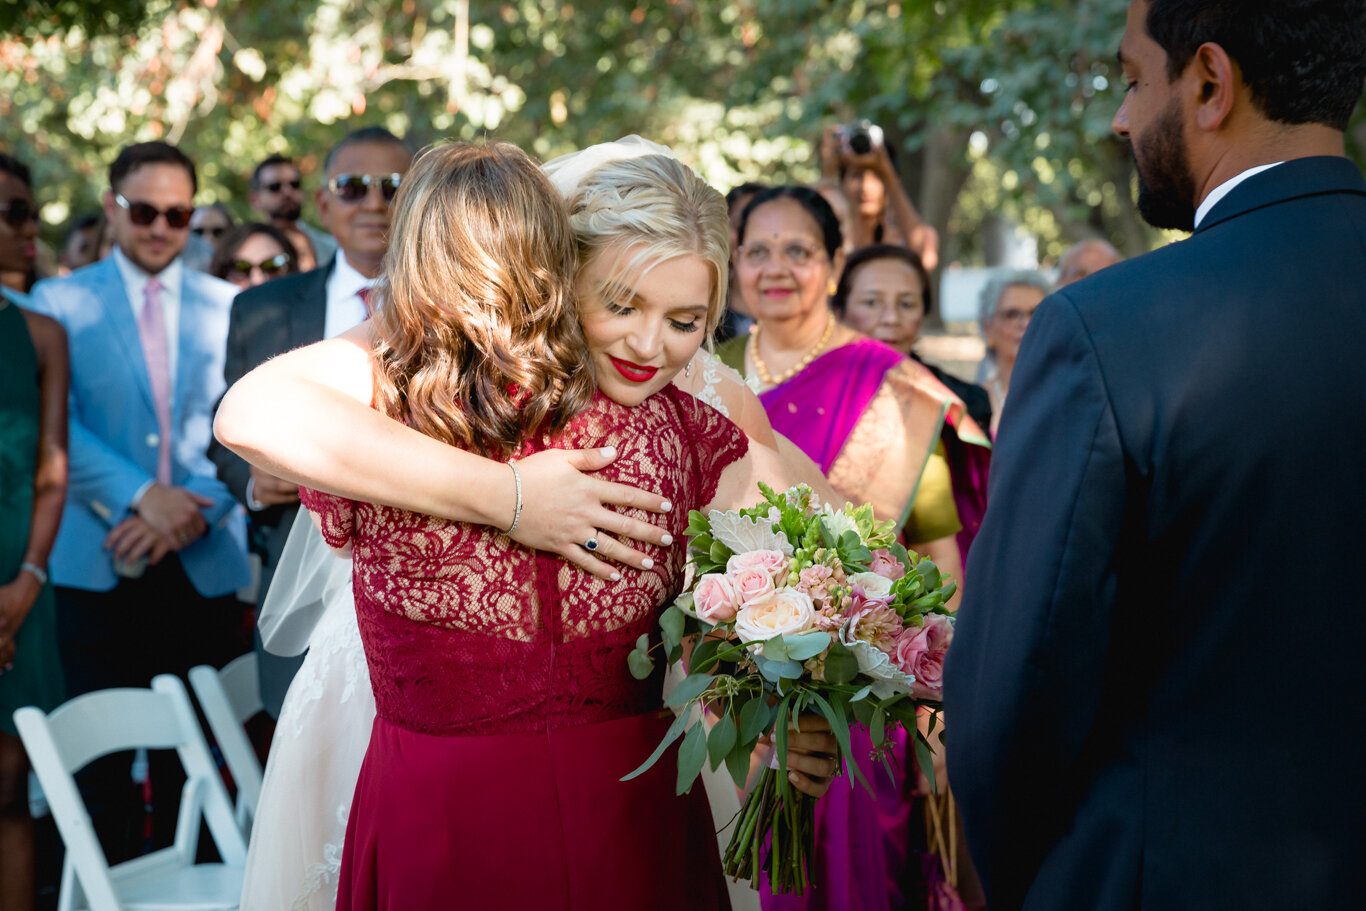 2019.08.24_Emily-Ashir-Wedding-at-the-Maples-5763.jpg